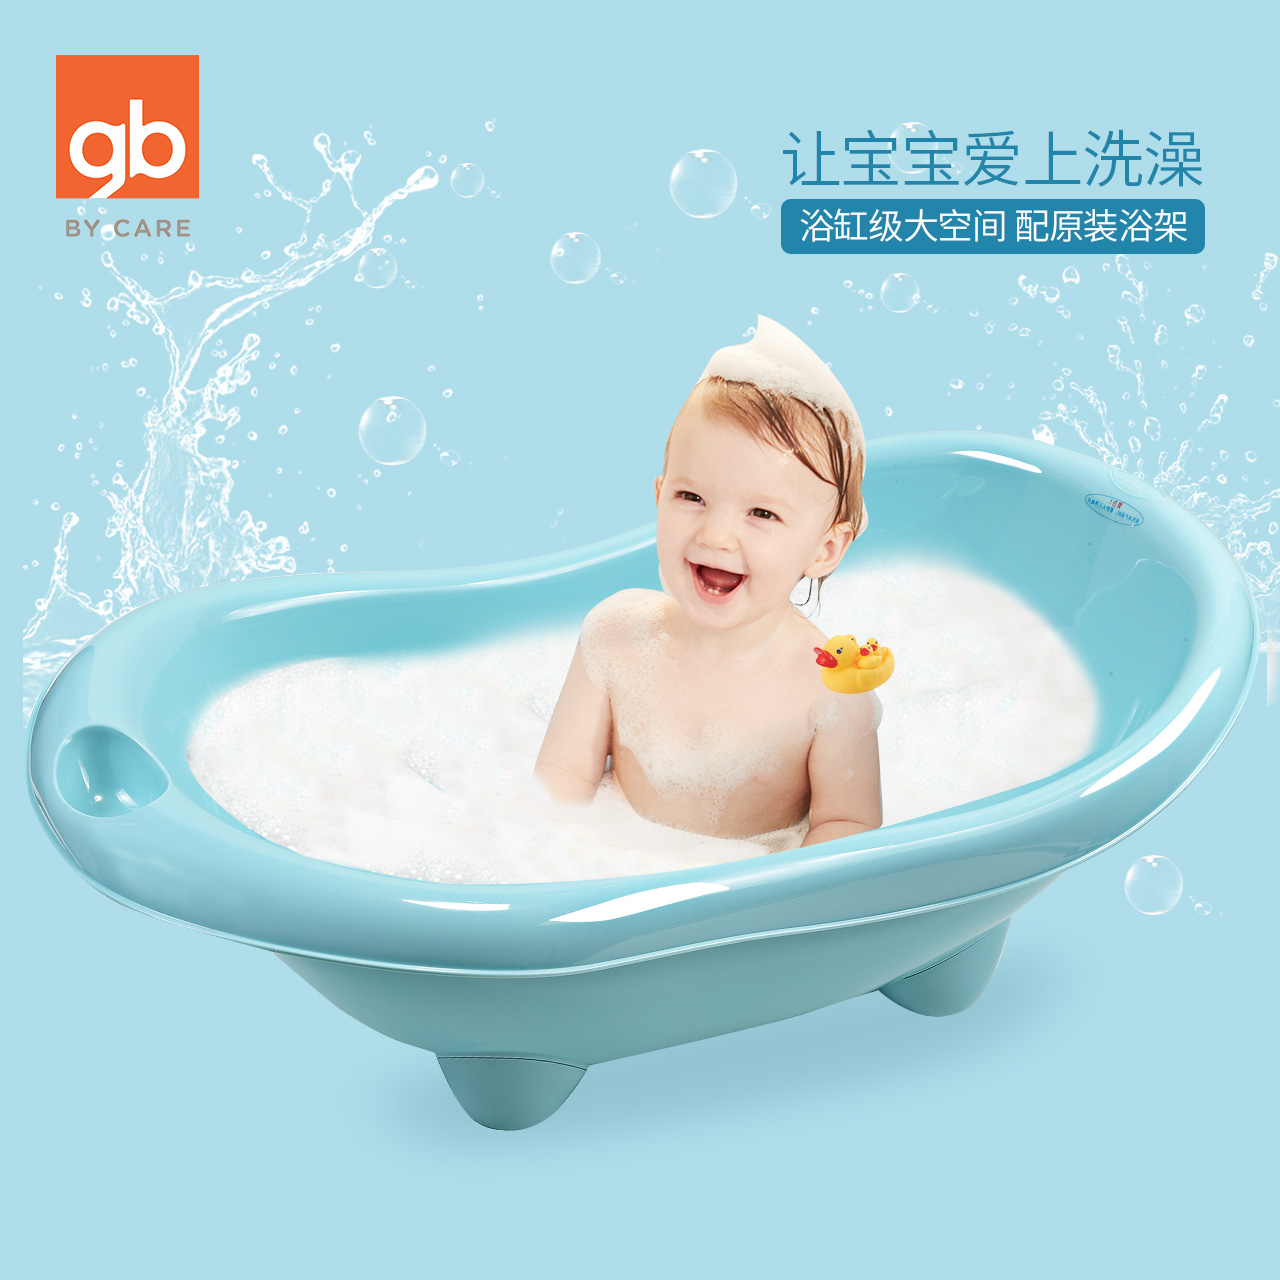 gb好孩子婴儿浴盆新生儿婴幼儿家用可坐可躺儿童洗澡盆宝贝沐浴盆